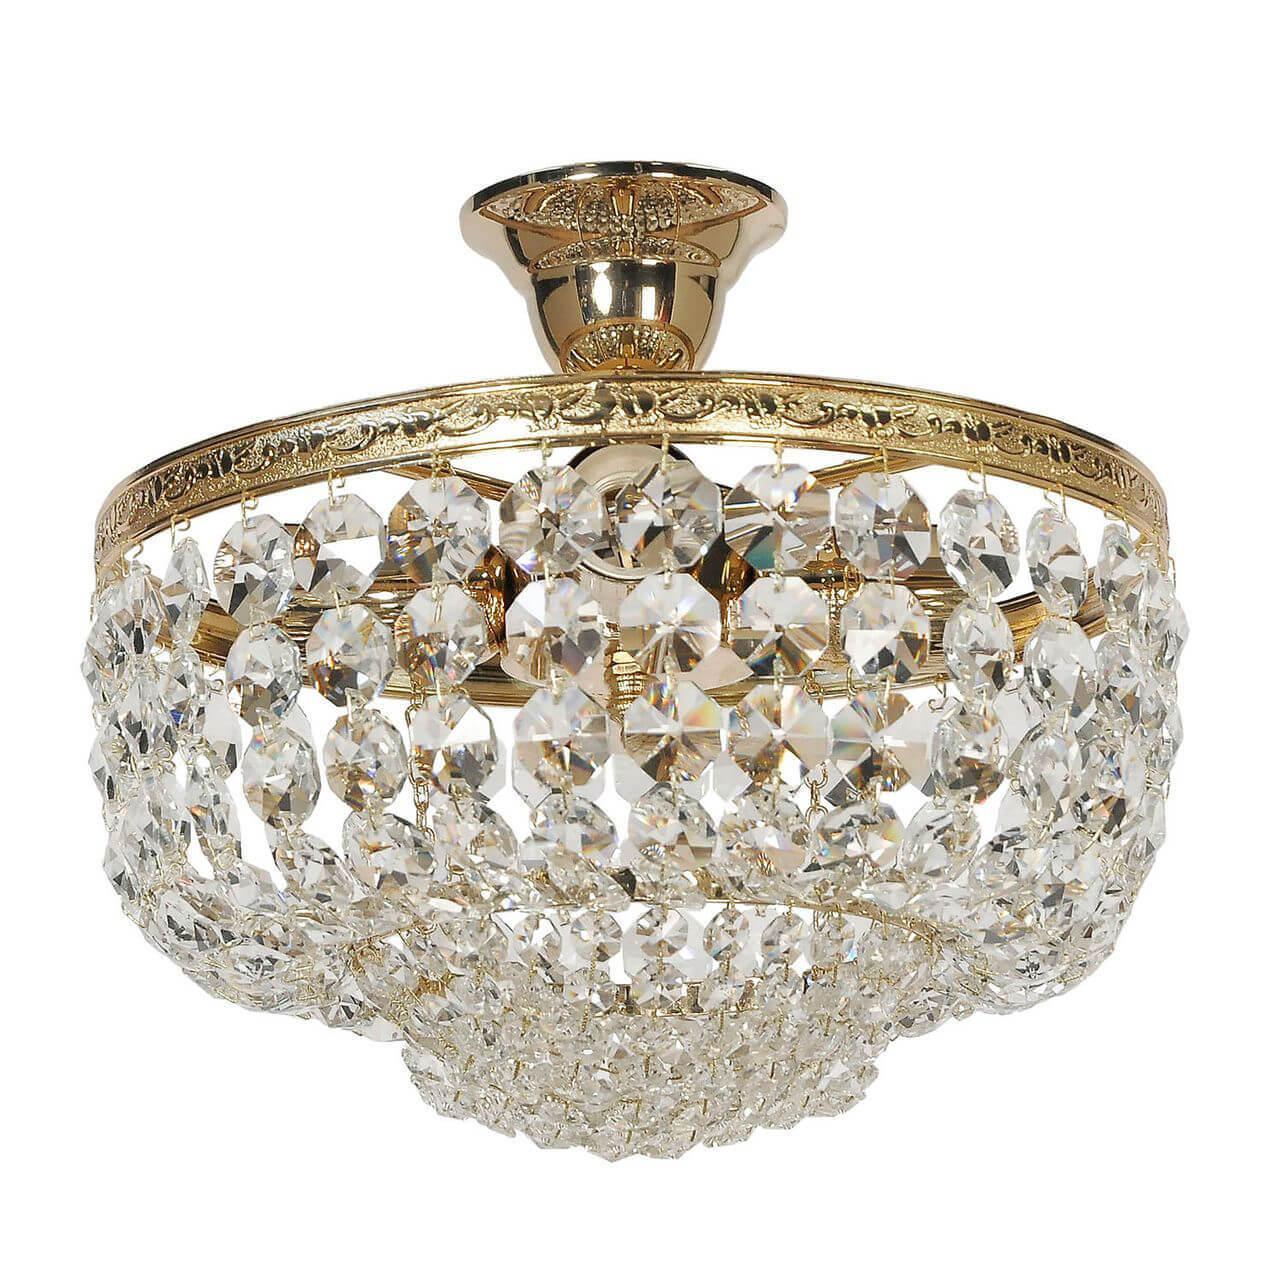 цена на Потолочный светильник Arti Lampadari Favola E 1.3.30.501 G